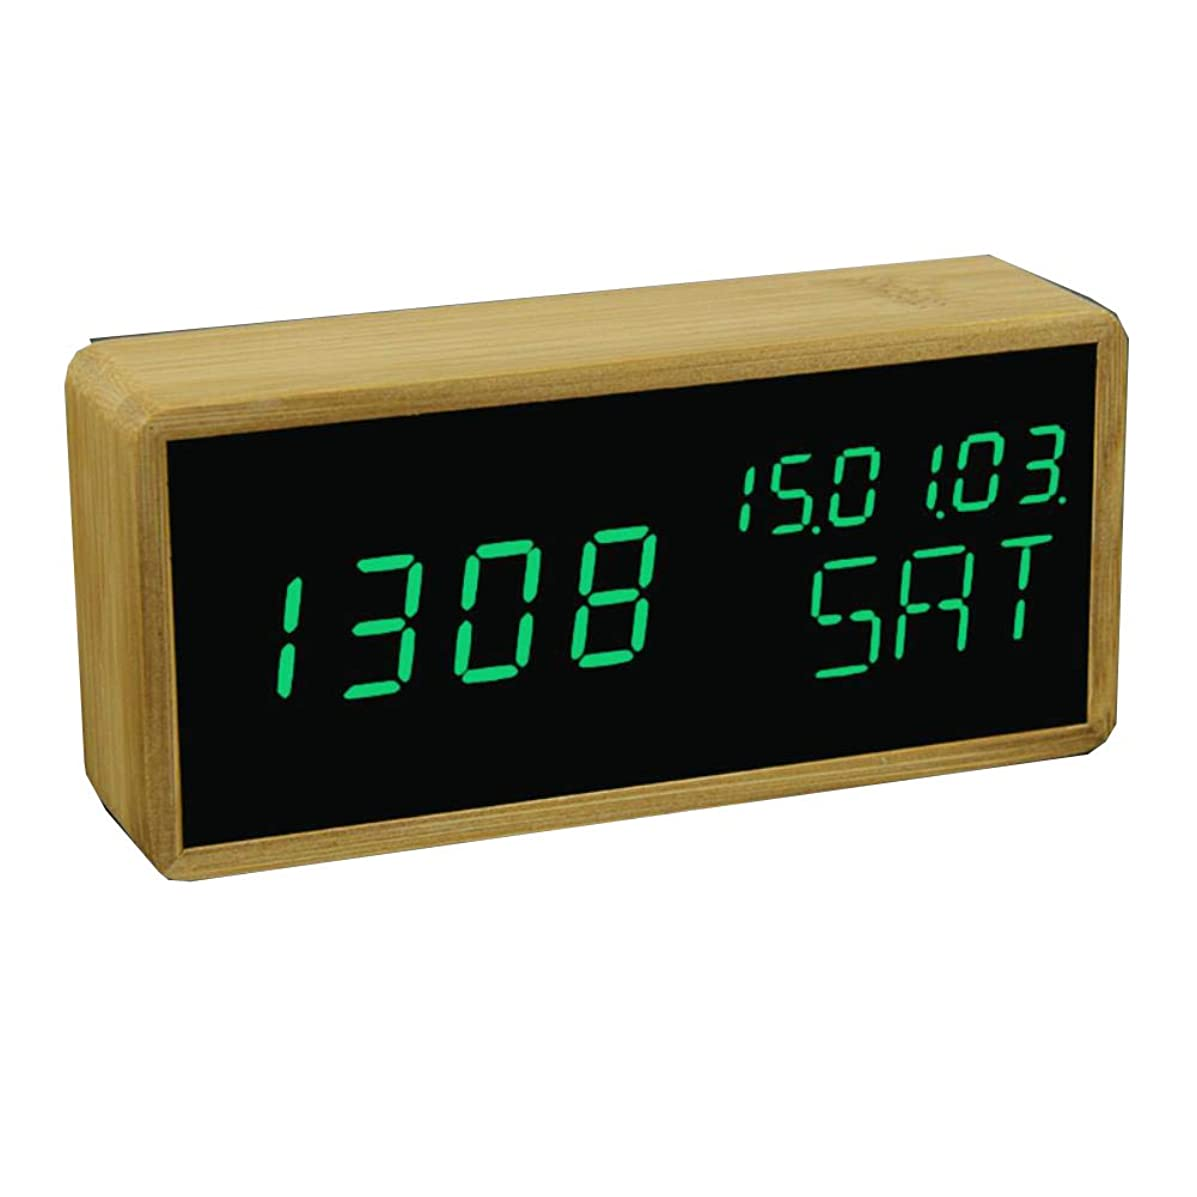 Digital Alarm Clock Adjustable Brightness Voice Control Desk Large Display Time Temperature USB/Battery Powered